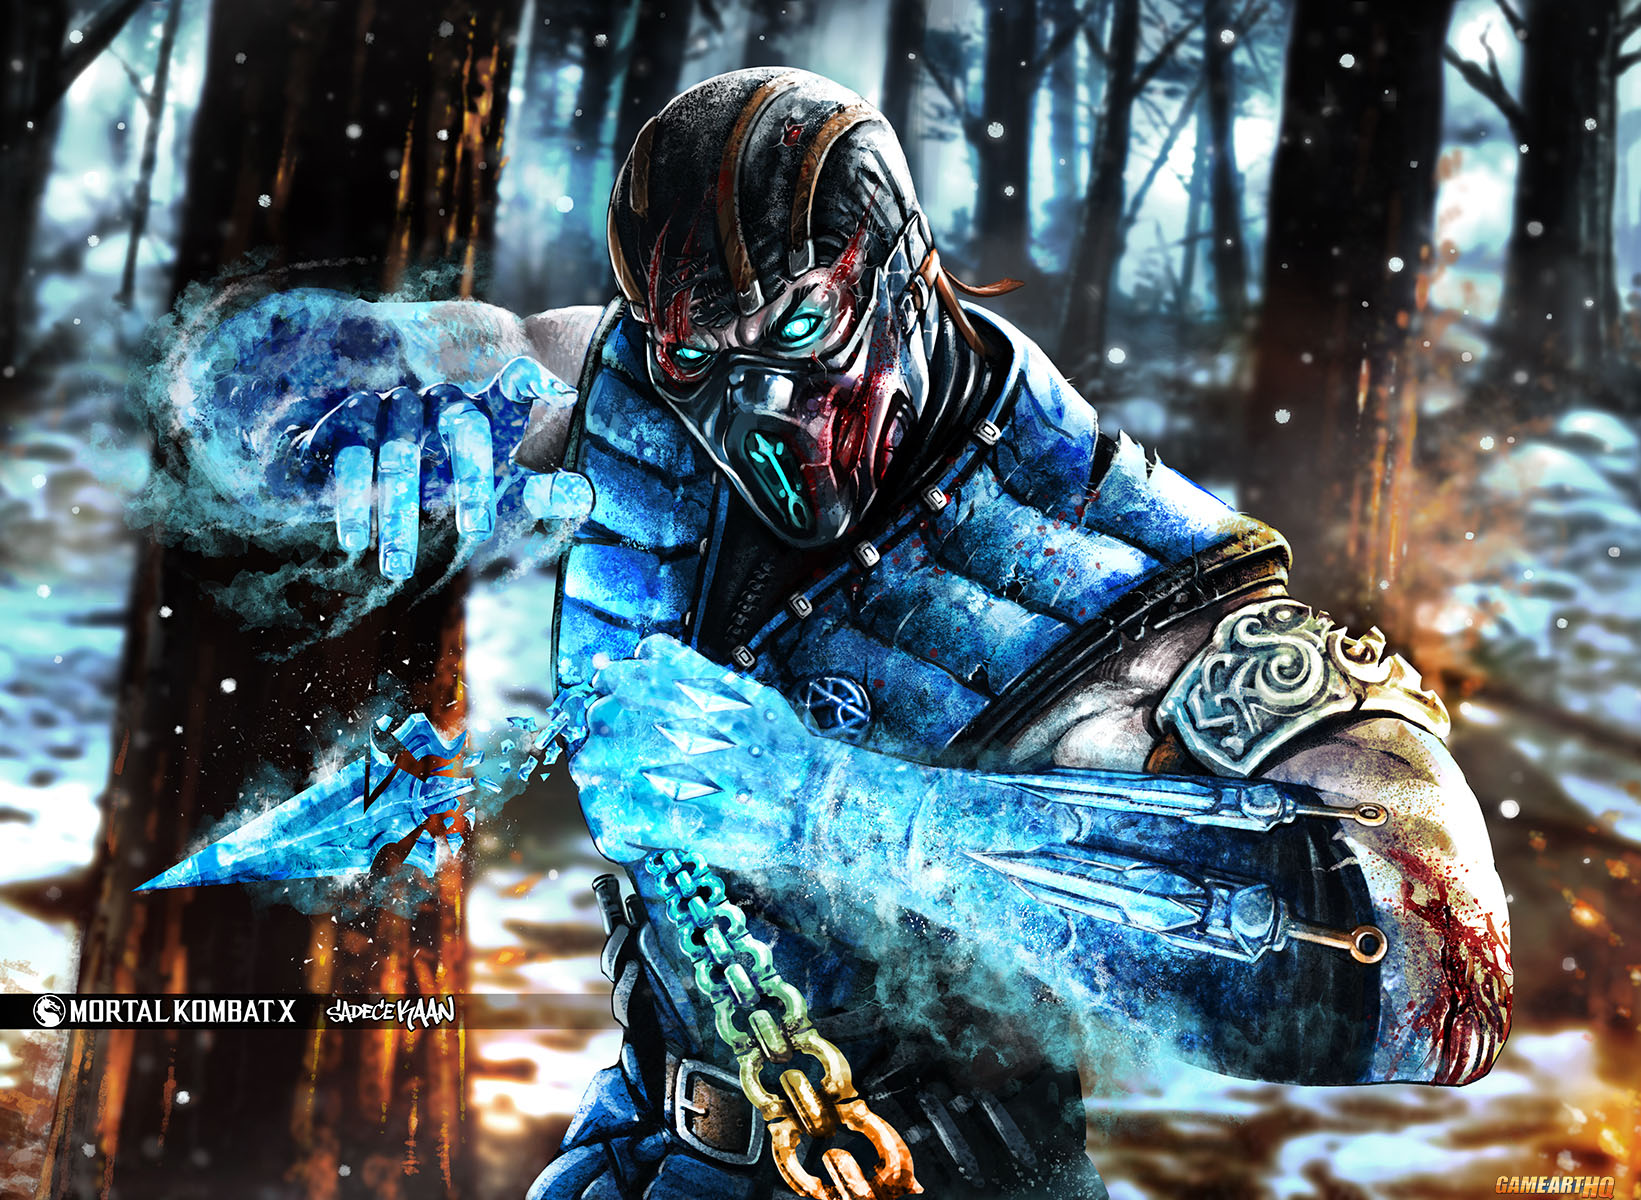 Mortal Kombat X Wallpaper Subzero Fanart SadeceKAAN from Turkey